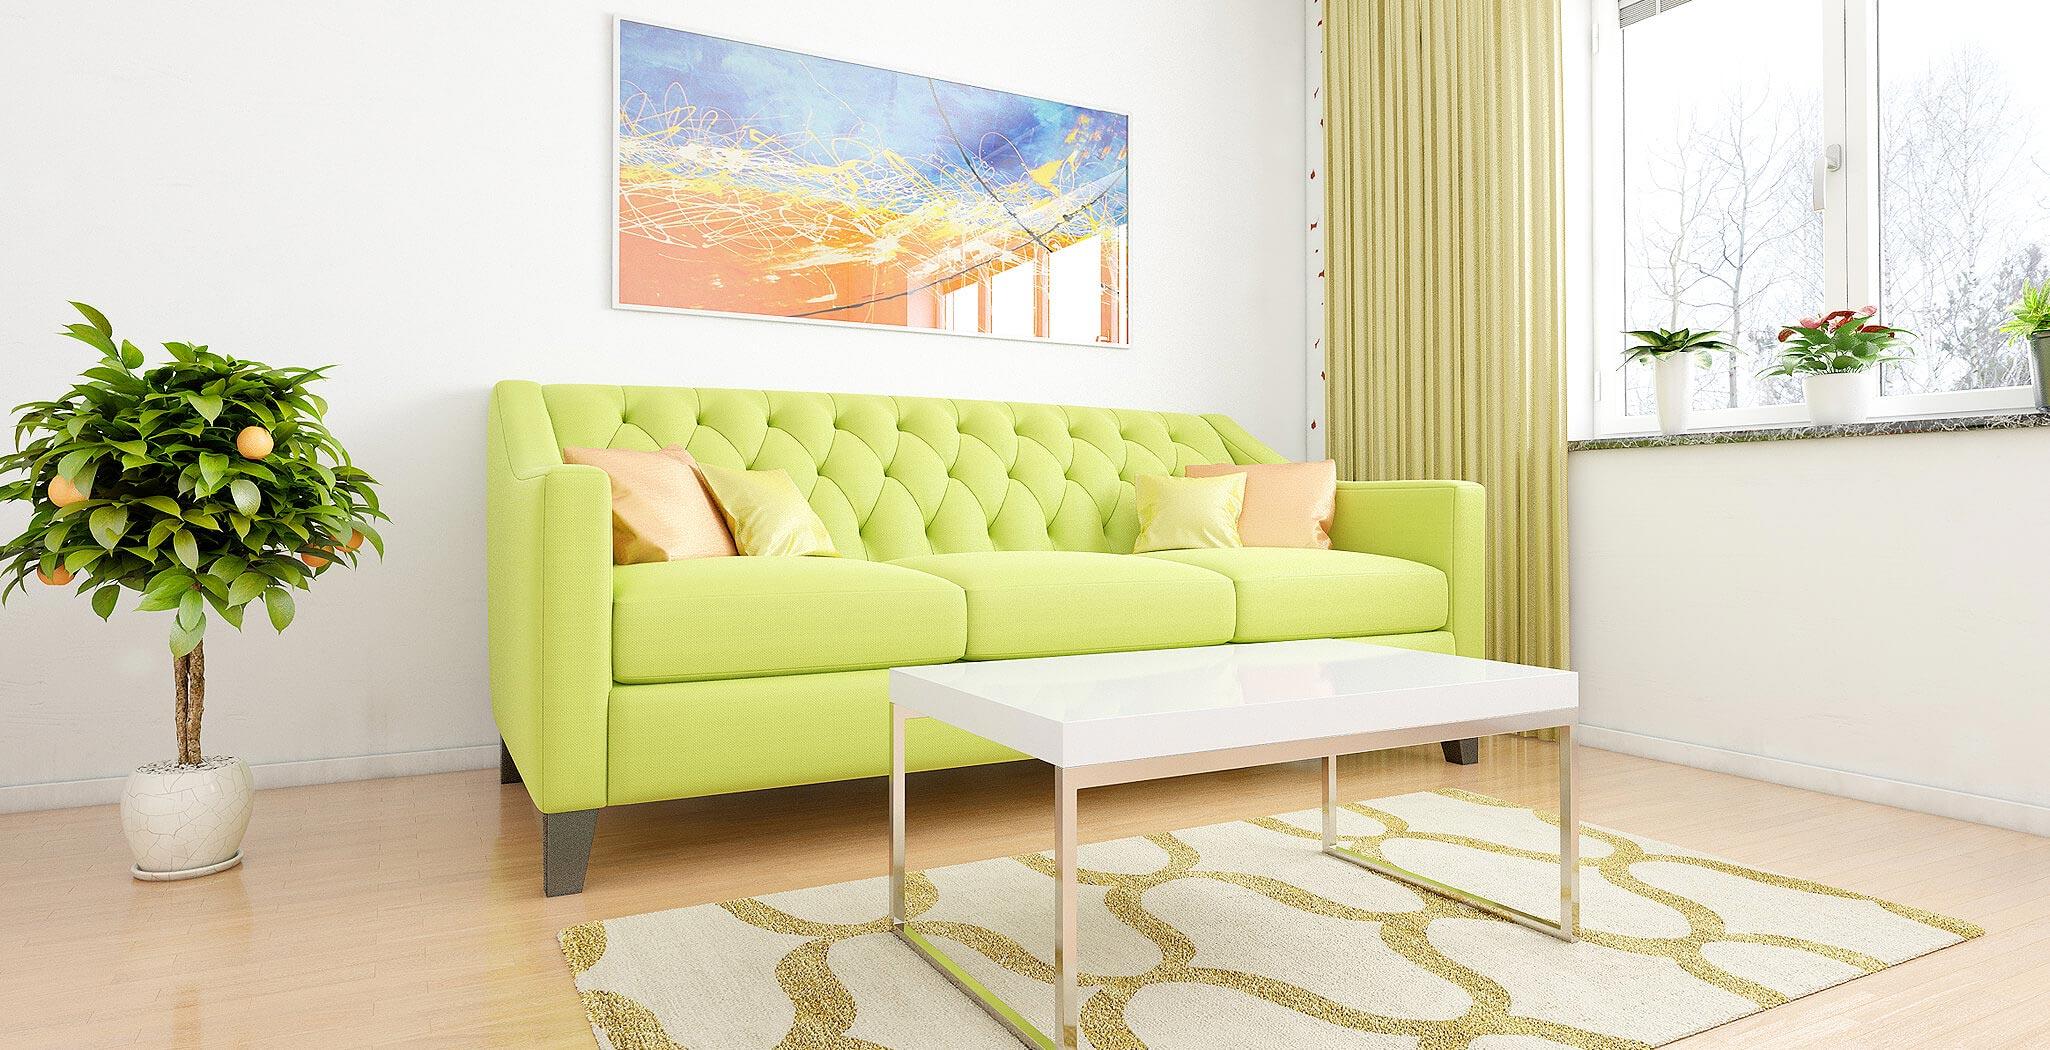 seville sofa furniture gallery 3